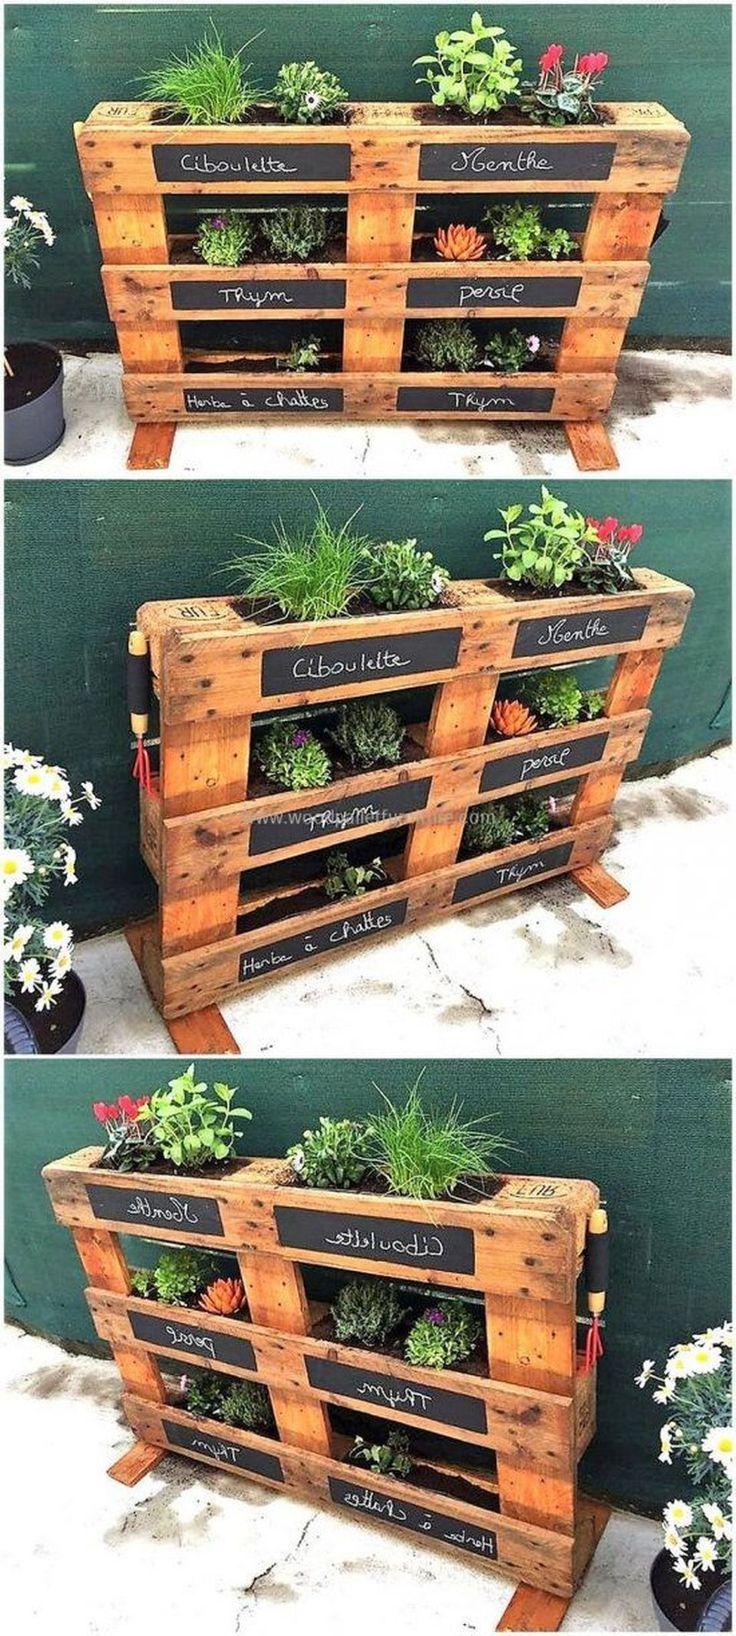 60 Amazing Creative Wood Pallet Garden Project Ideas #herbgardendesignideas